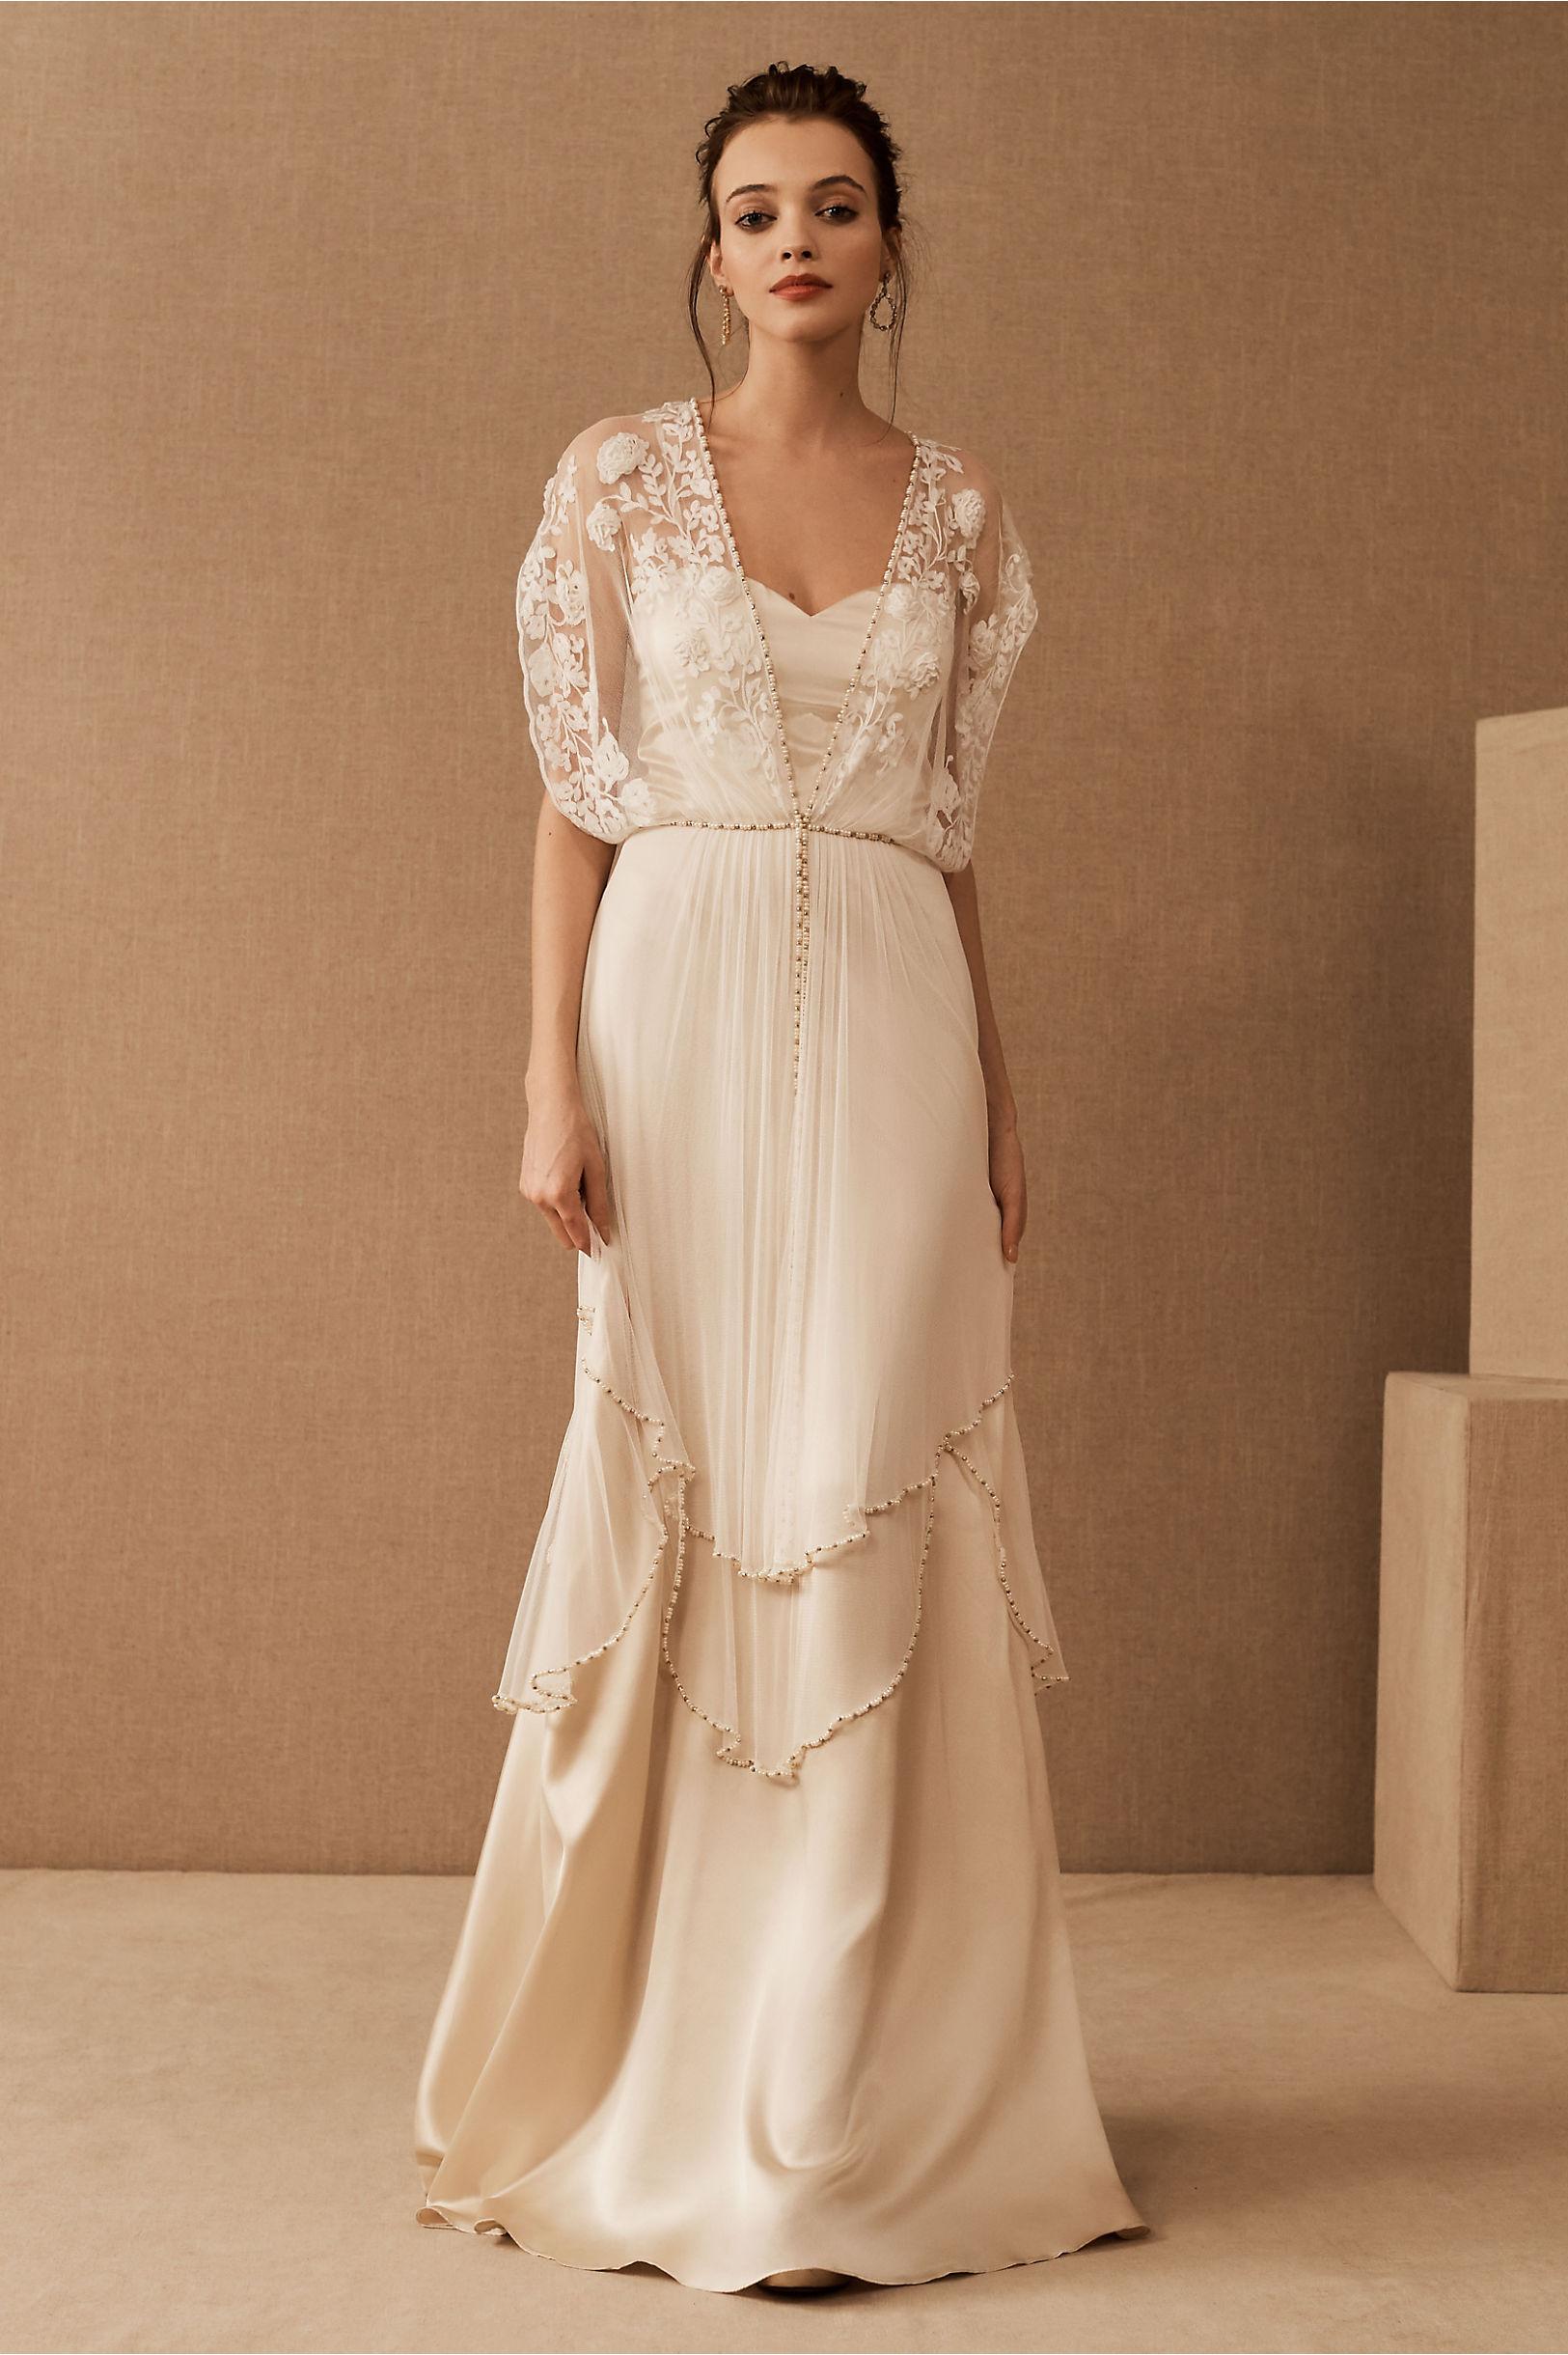 Victorian Wedding Dresses, Shoes, Accessories Catherine Deane Lita GownSize Guide Video  AT vintagedancer.com